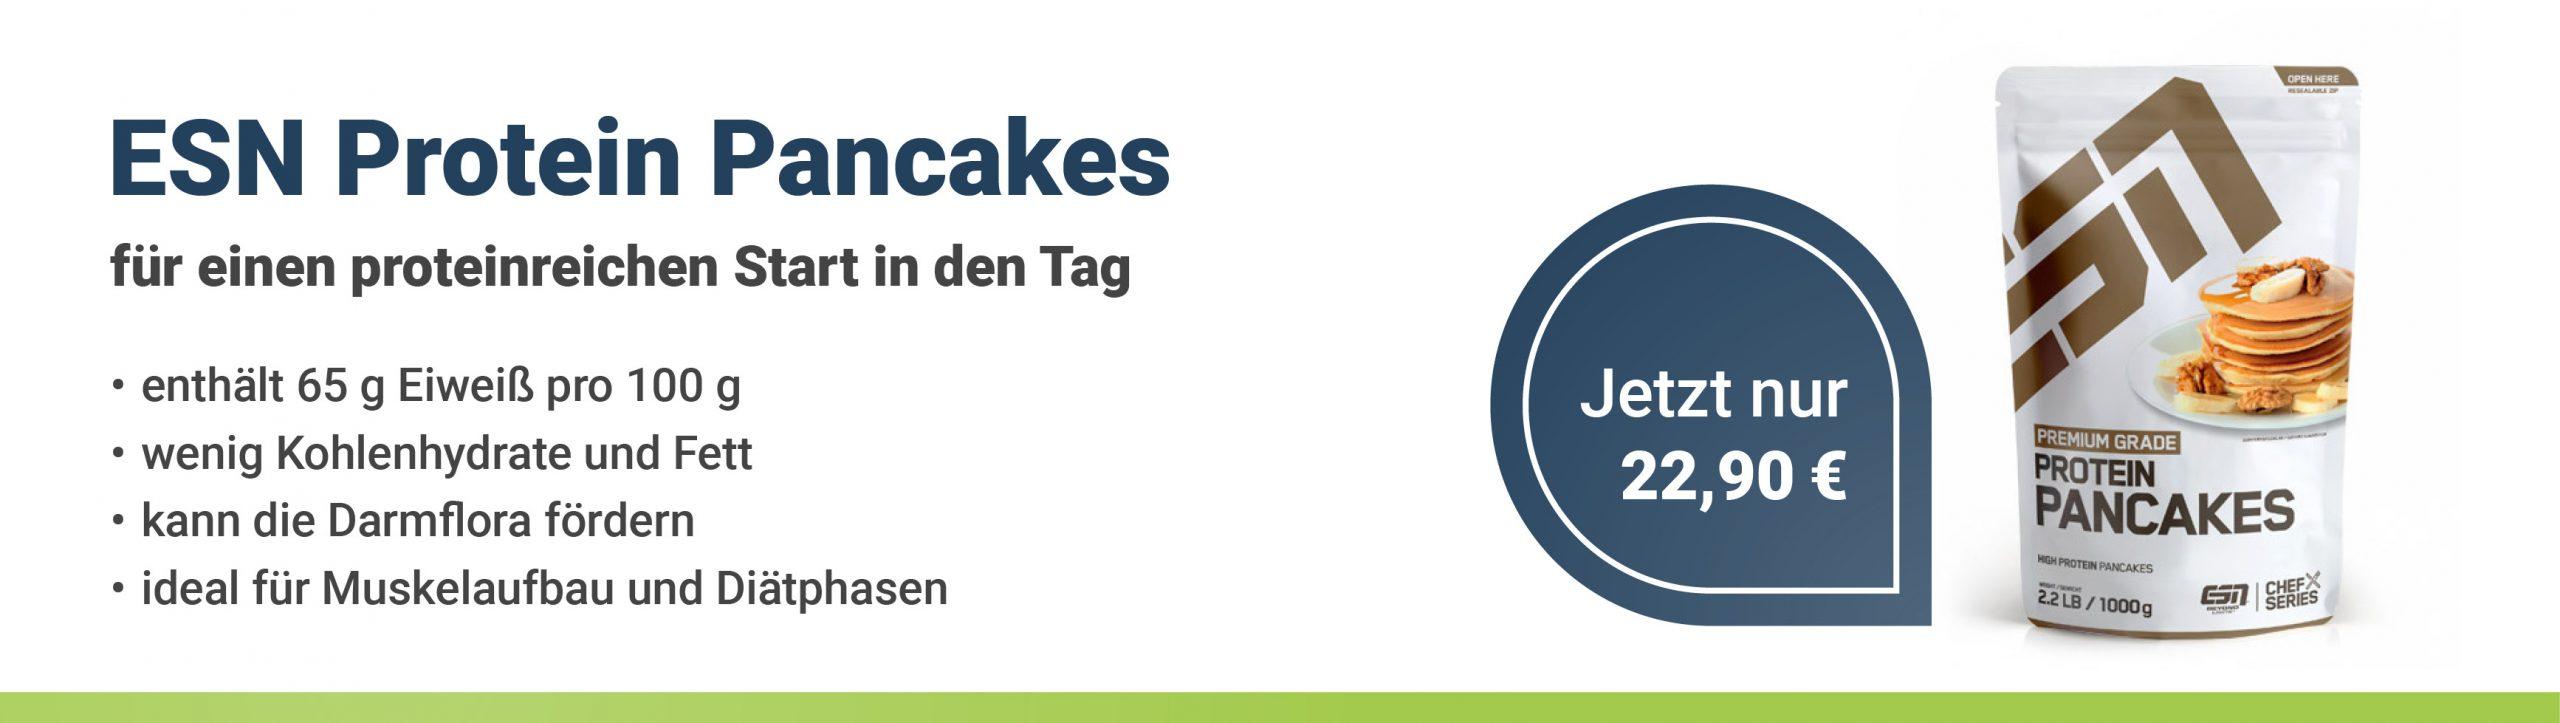 https://www.health-rise.de/wp-content/uploads/2021/08/ESN-Protein-Pancakes_mobil.jpg